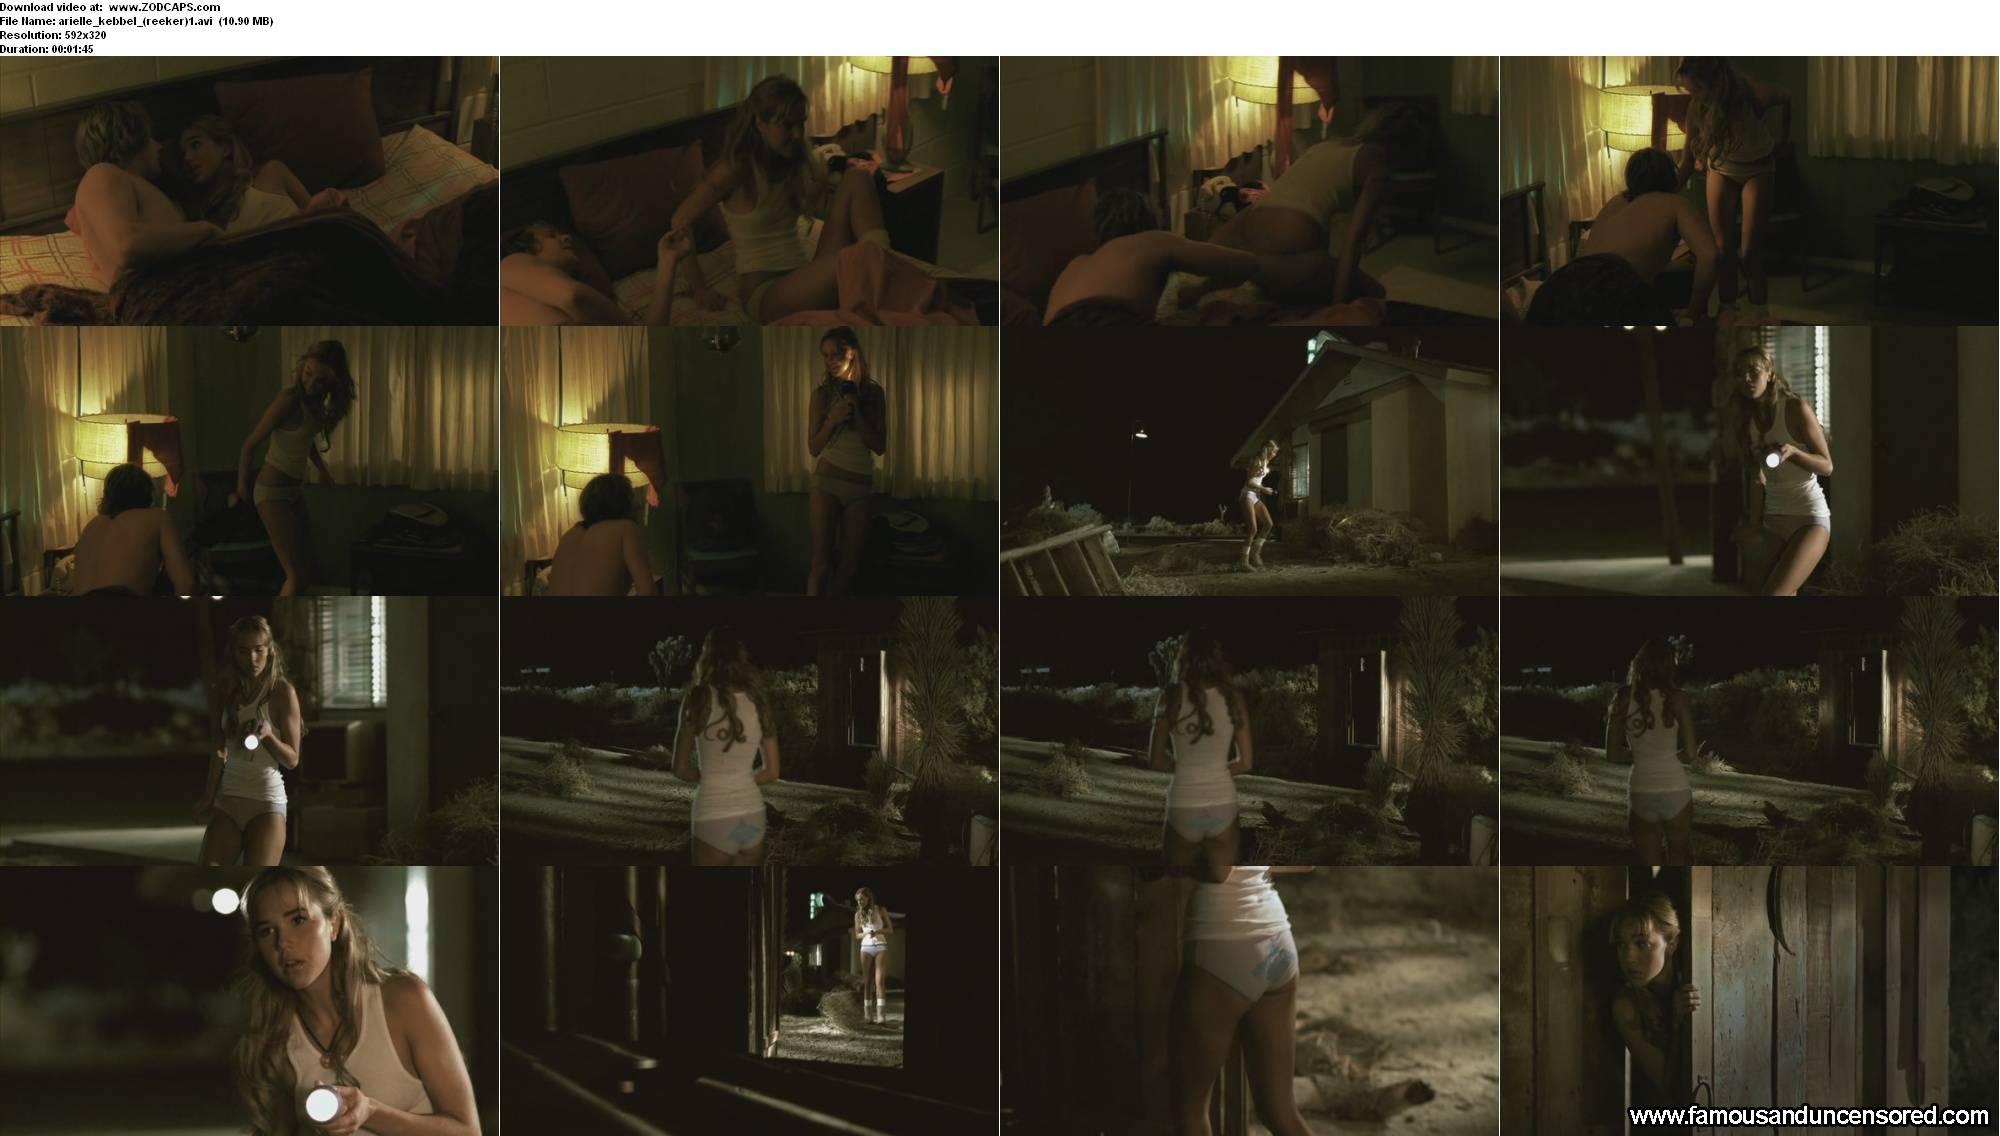 Arielle Kebbel Nude Photo Porns Arielle Kebbel Nude Photo Sex Pics